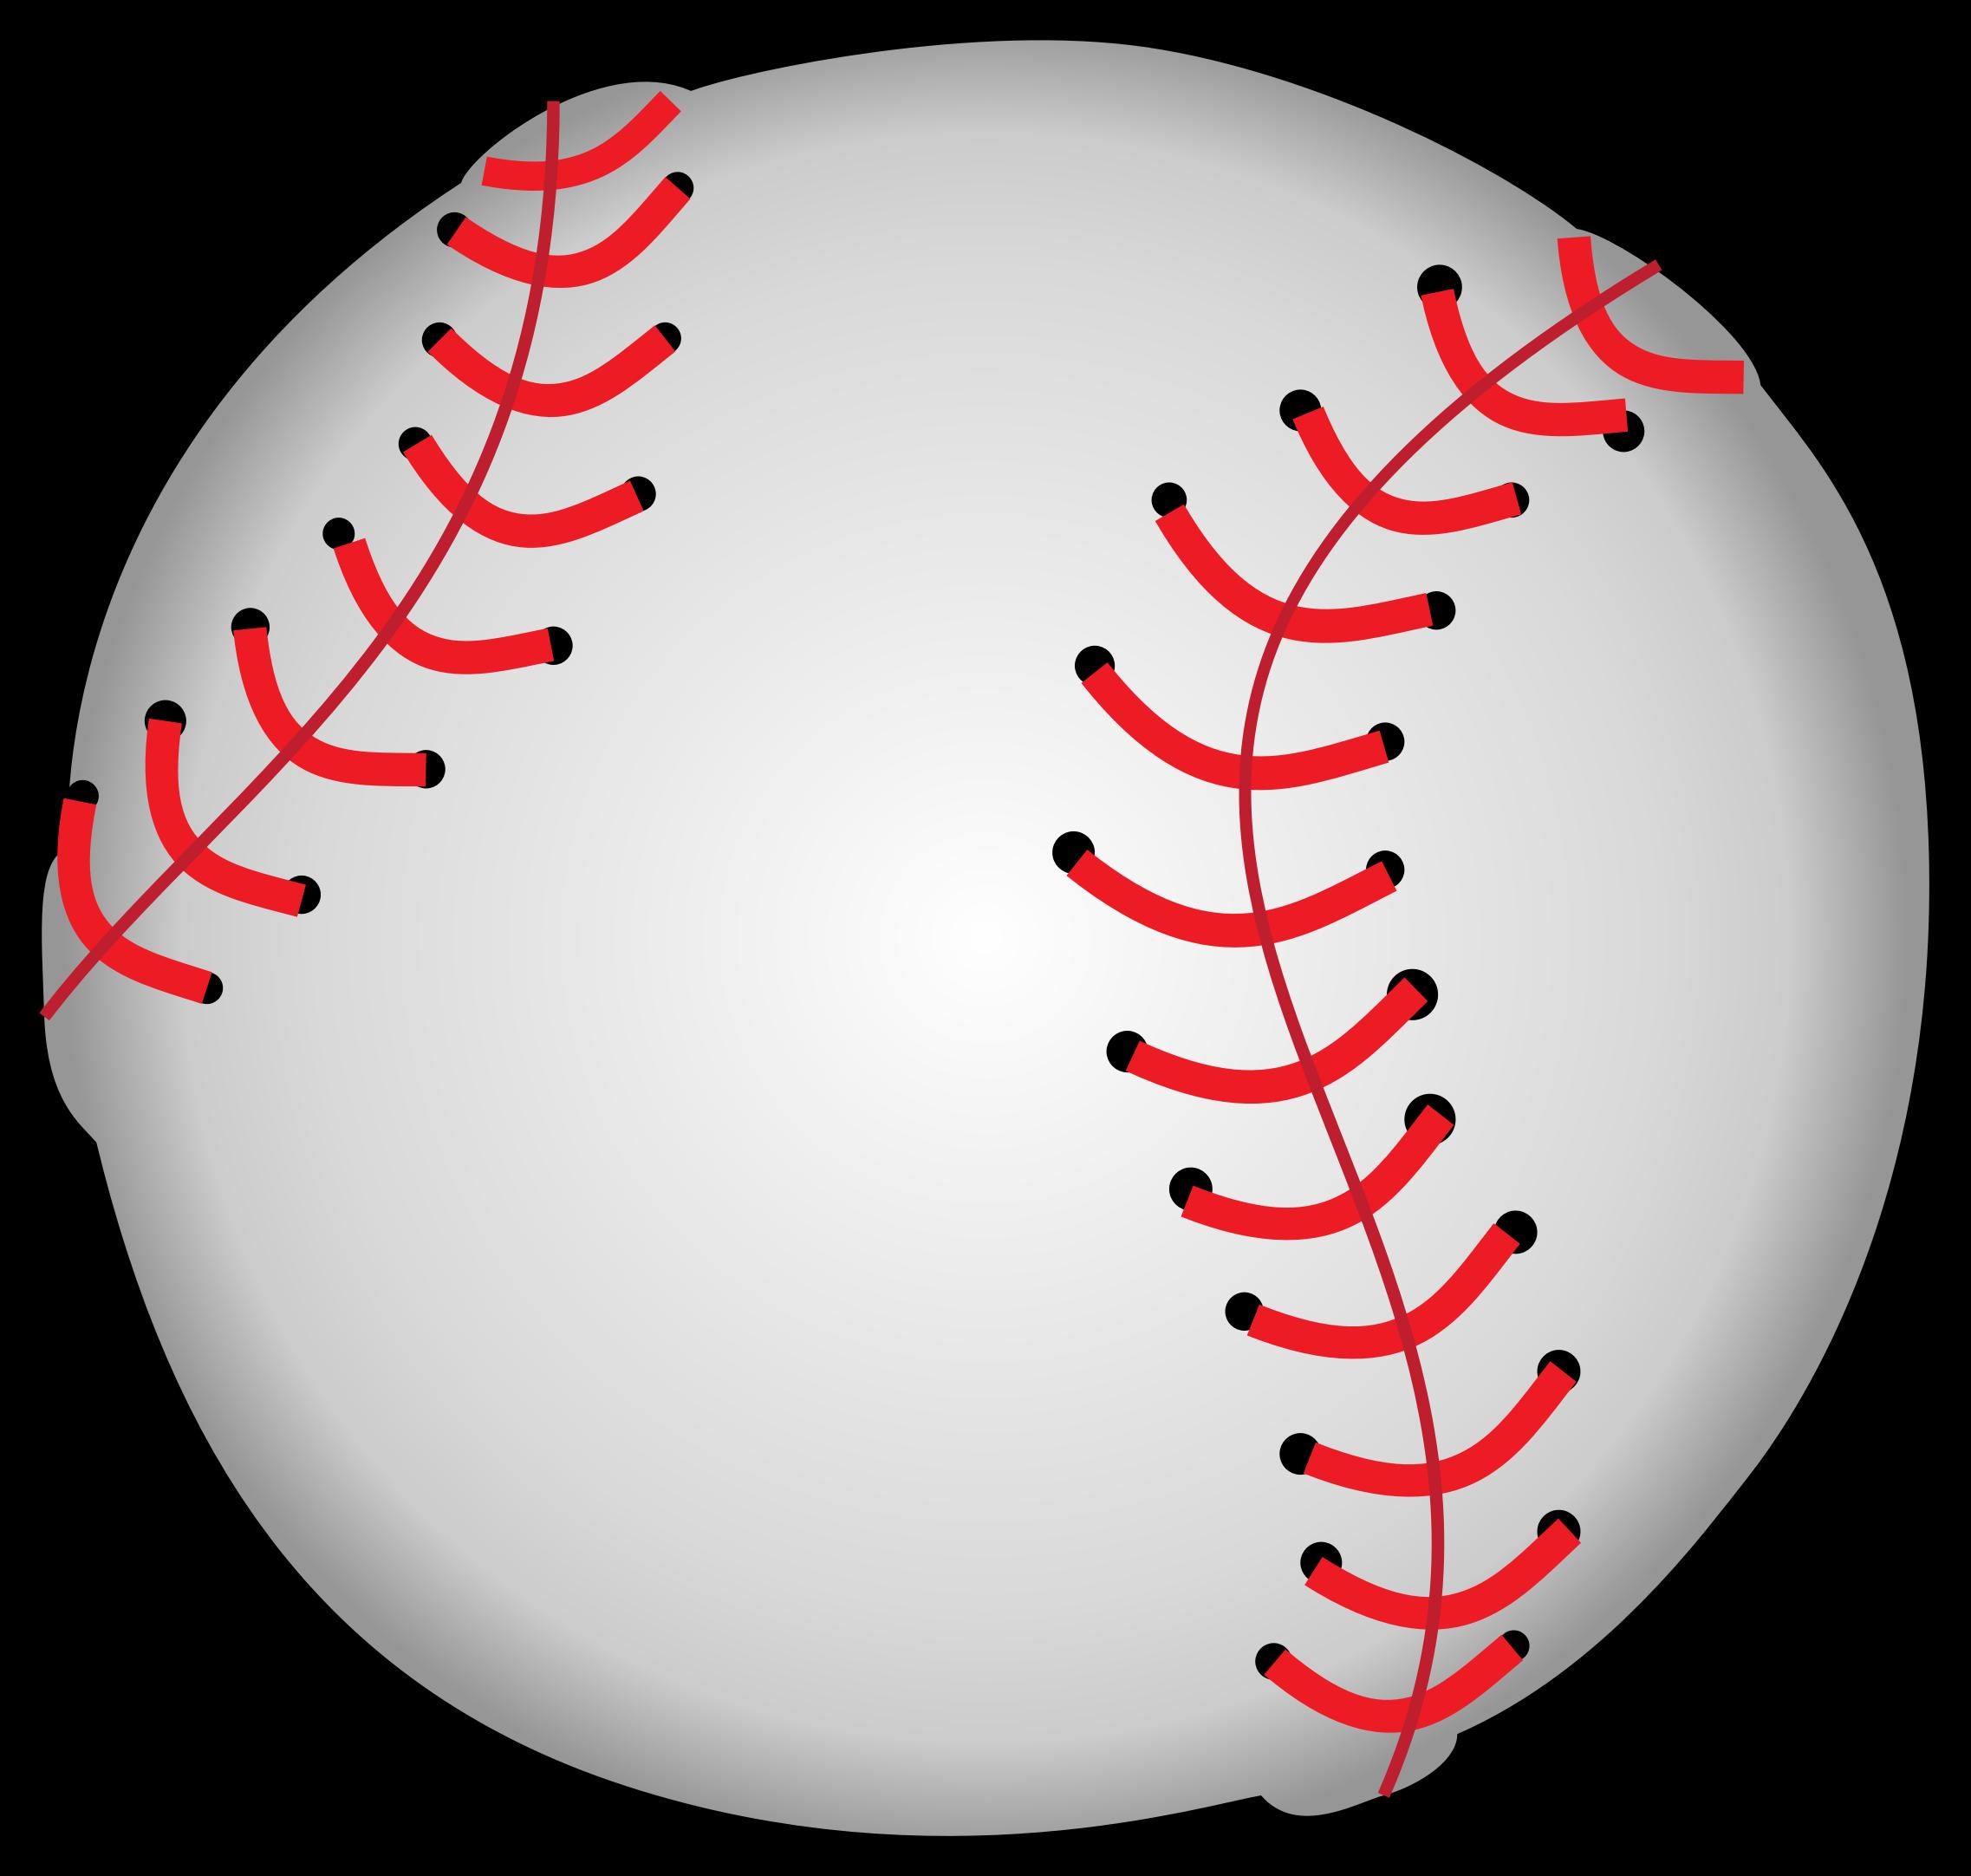 Big image png. Game clipart baseball